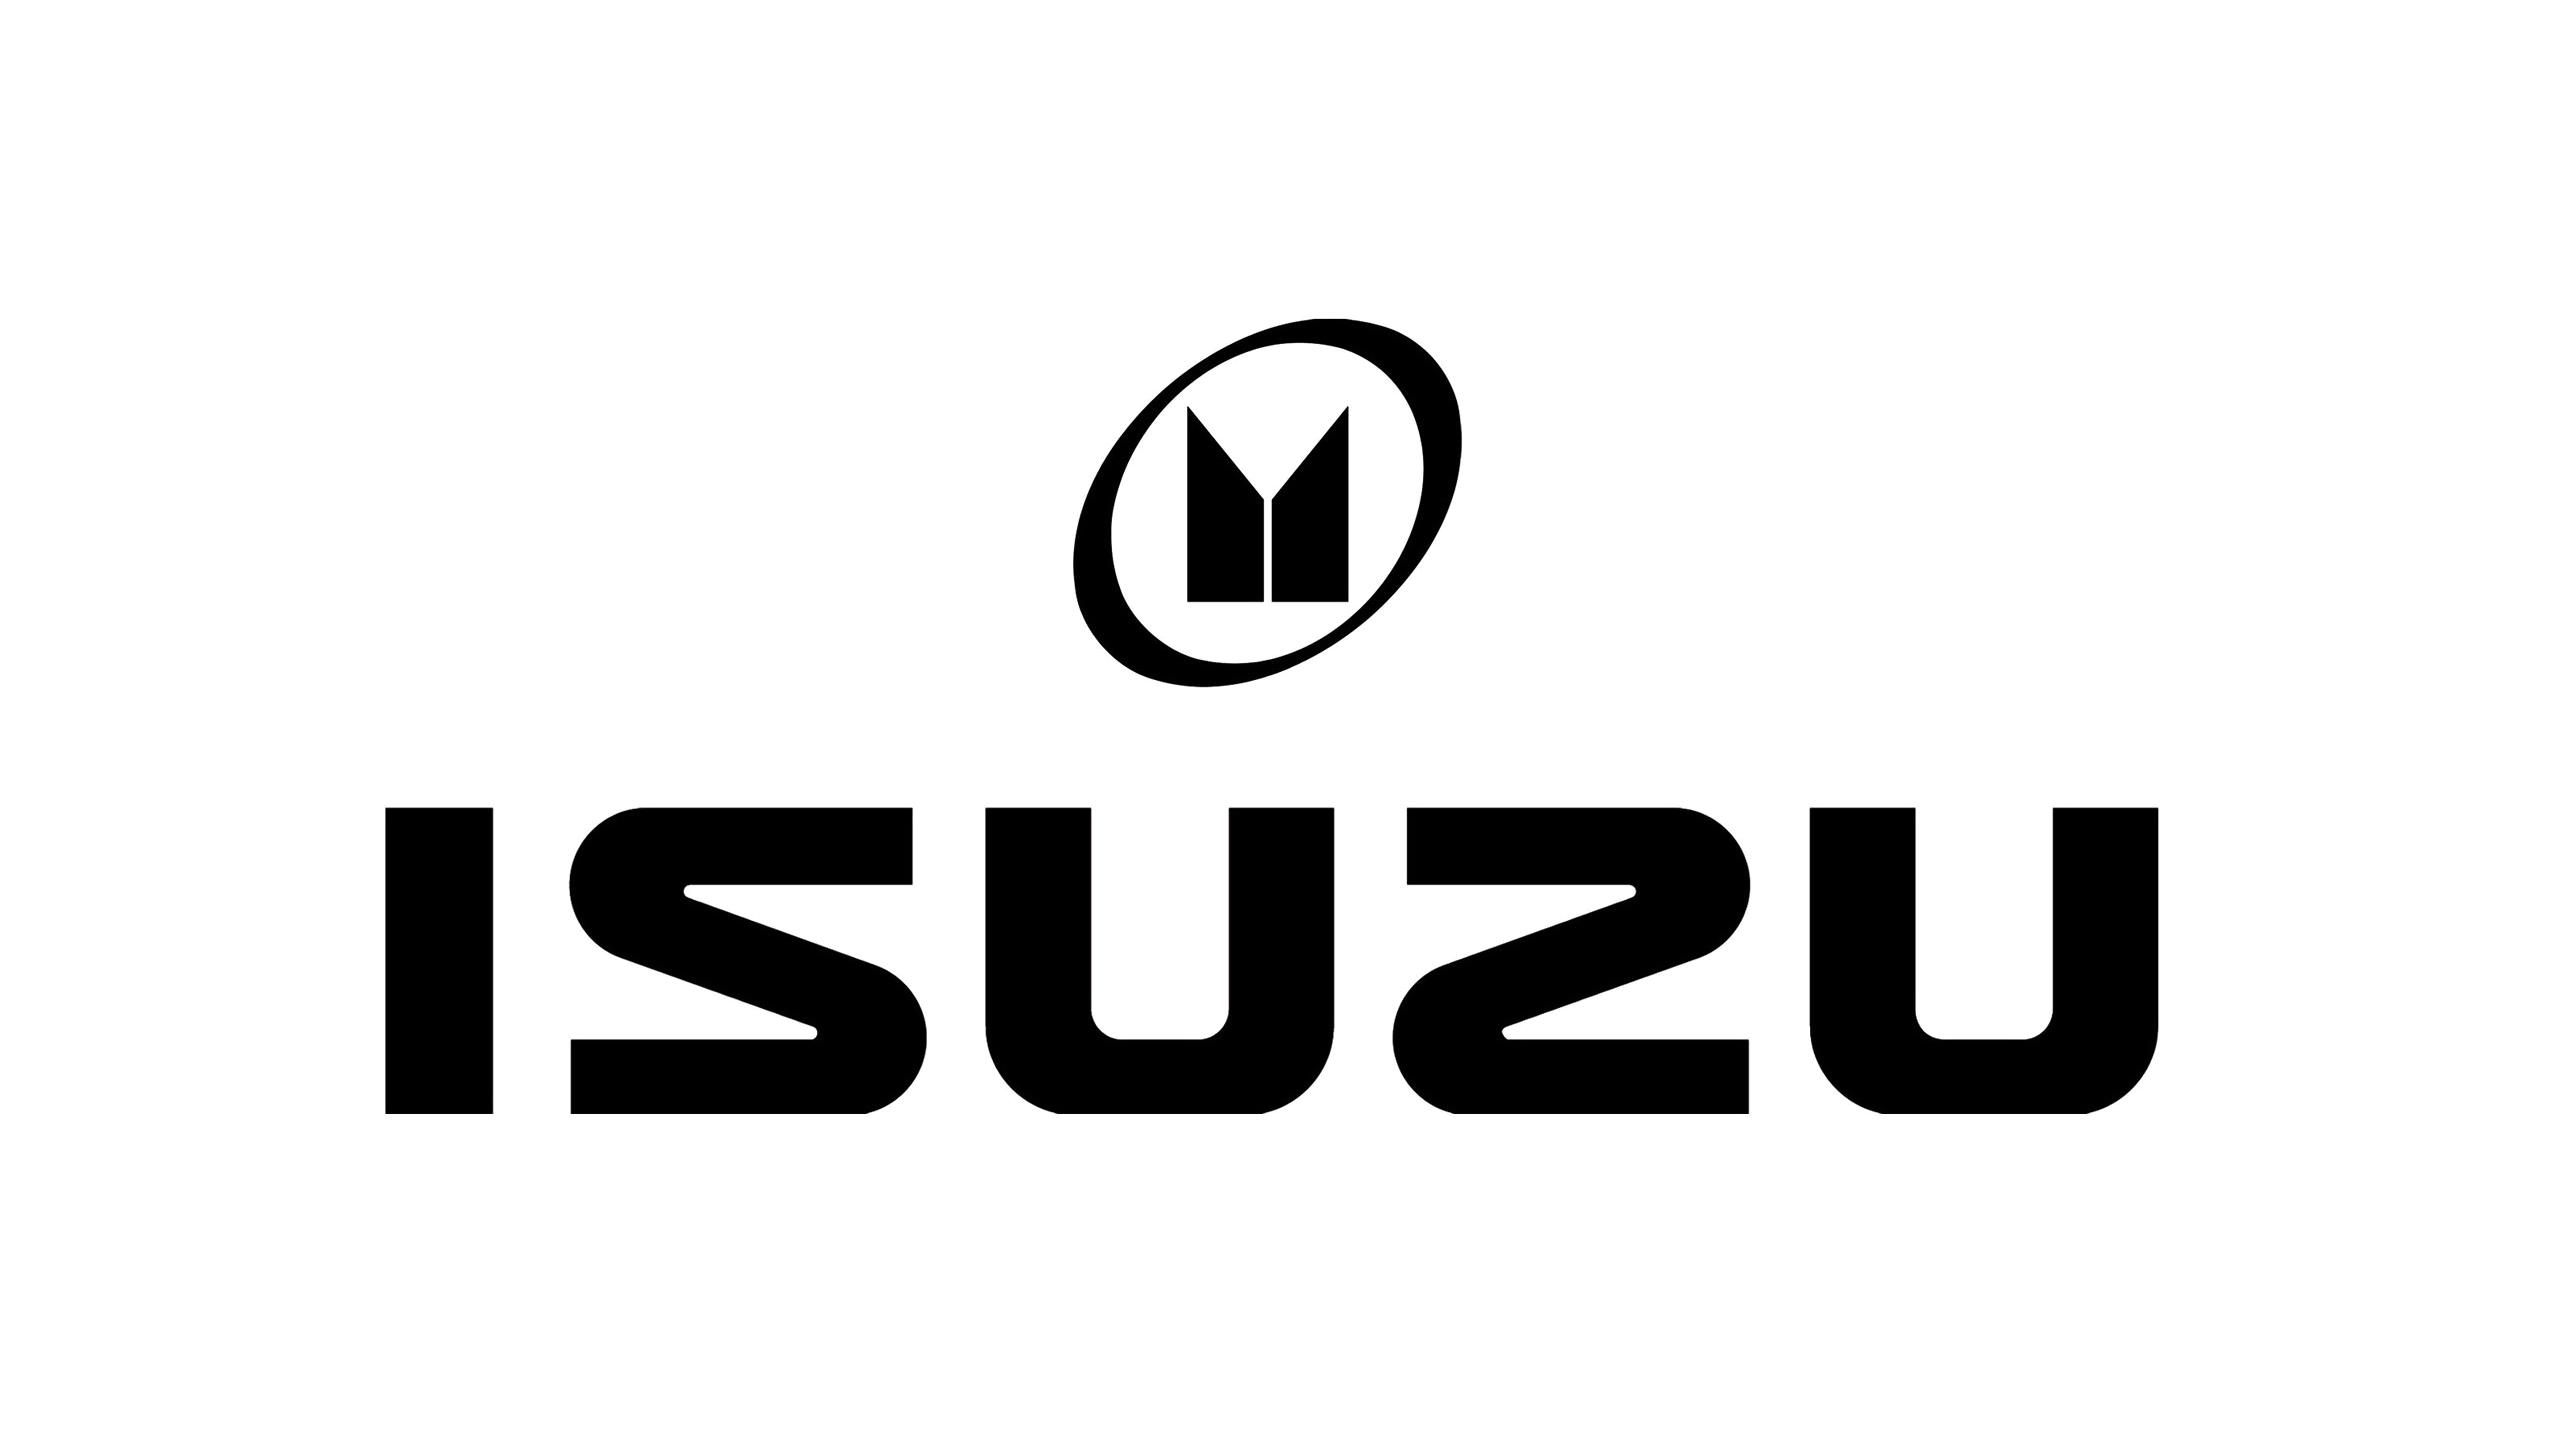 isuzu logo  hd png  meaning  information